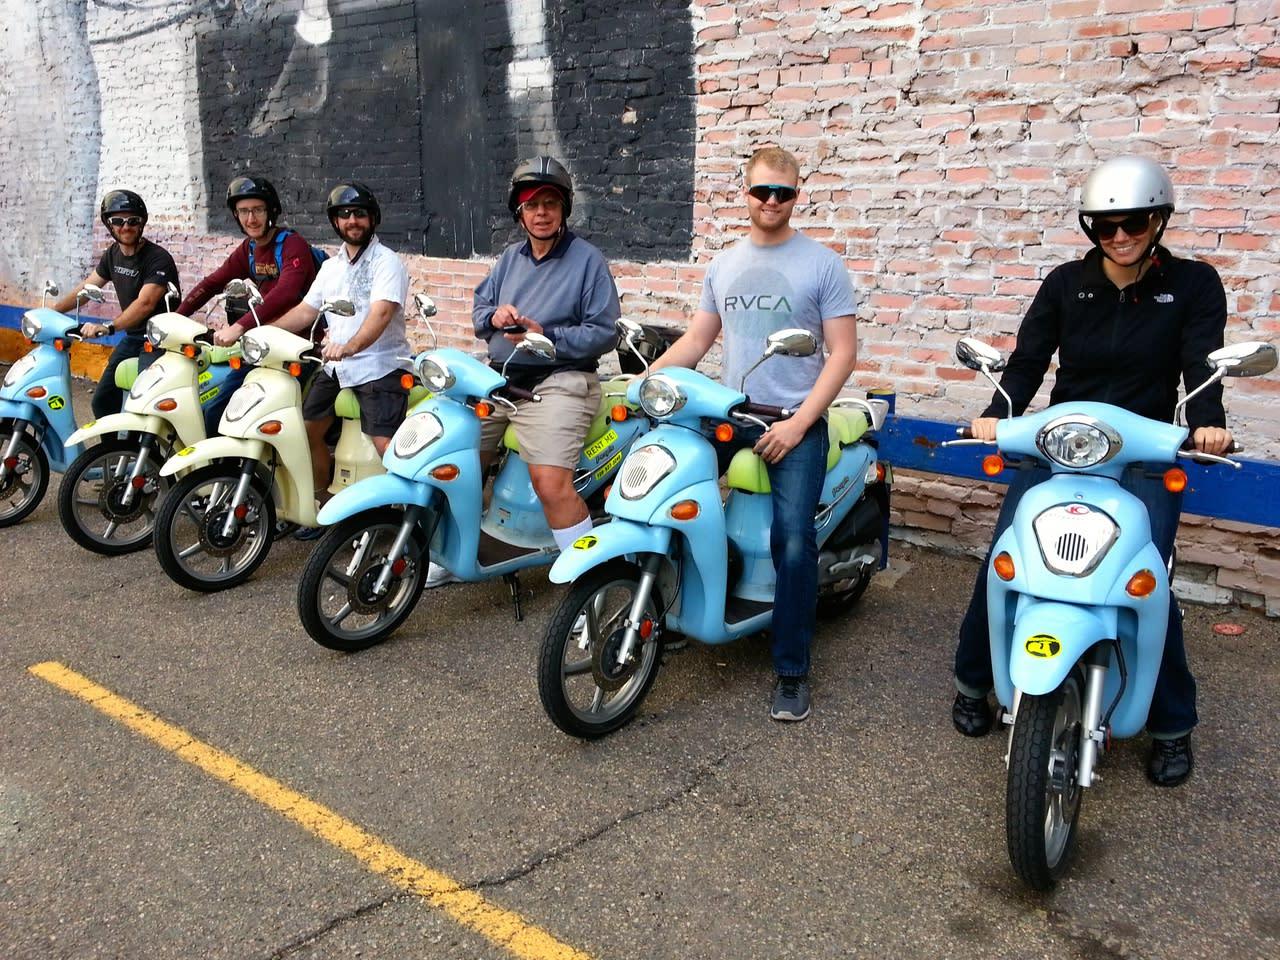 scootours denver scooter rental tours